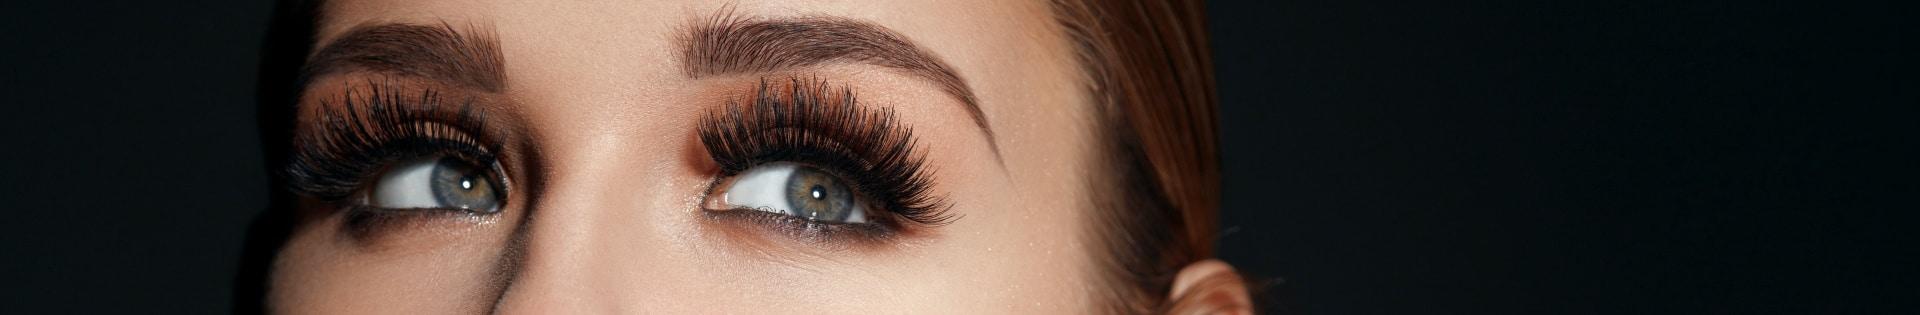 Beautiful woman's eyebrows